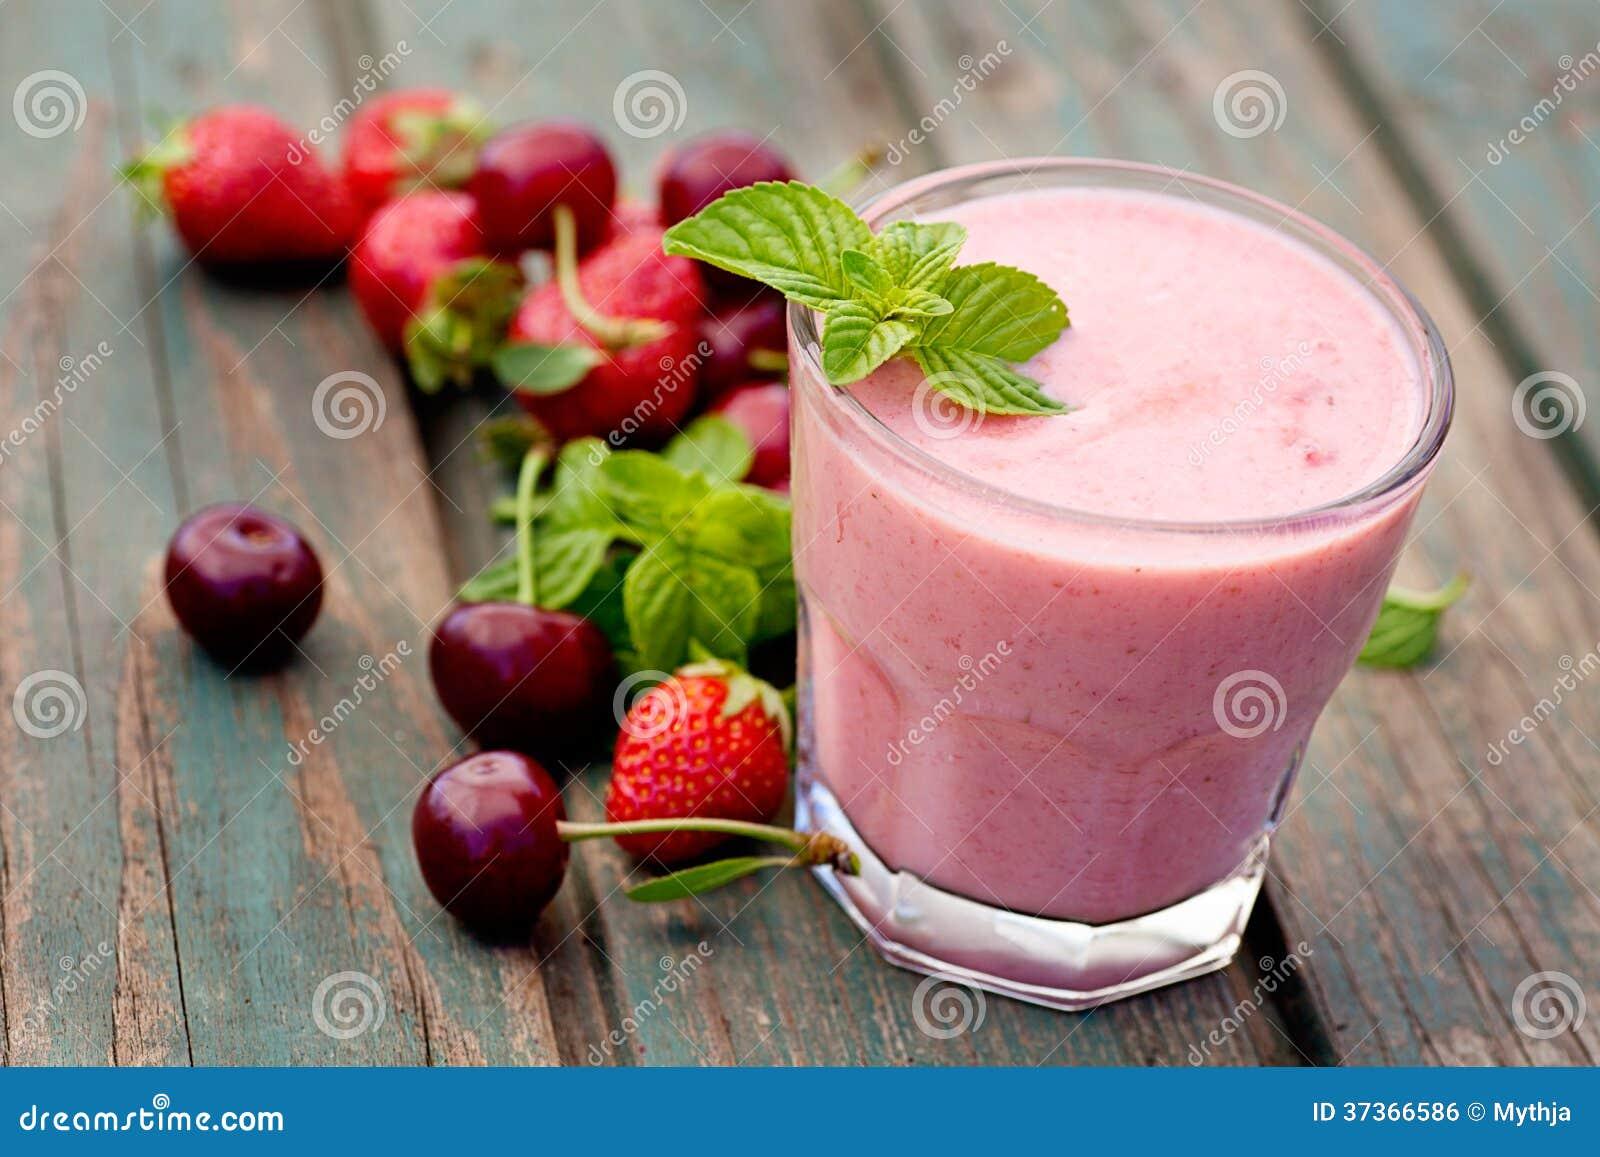 healthy yogurt fruit smoothie organic fruit